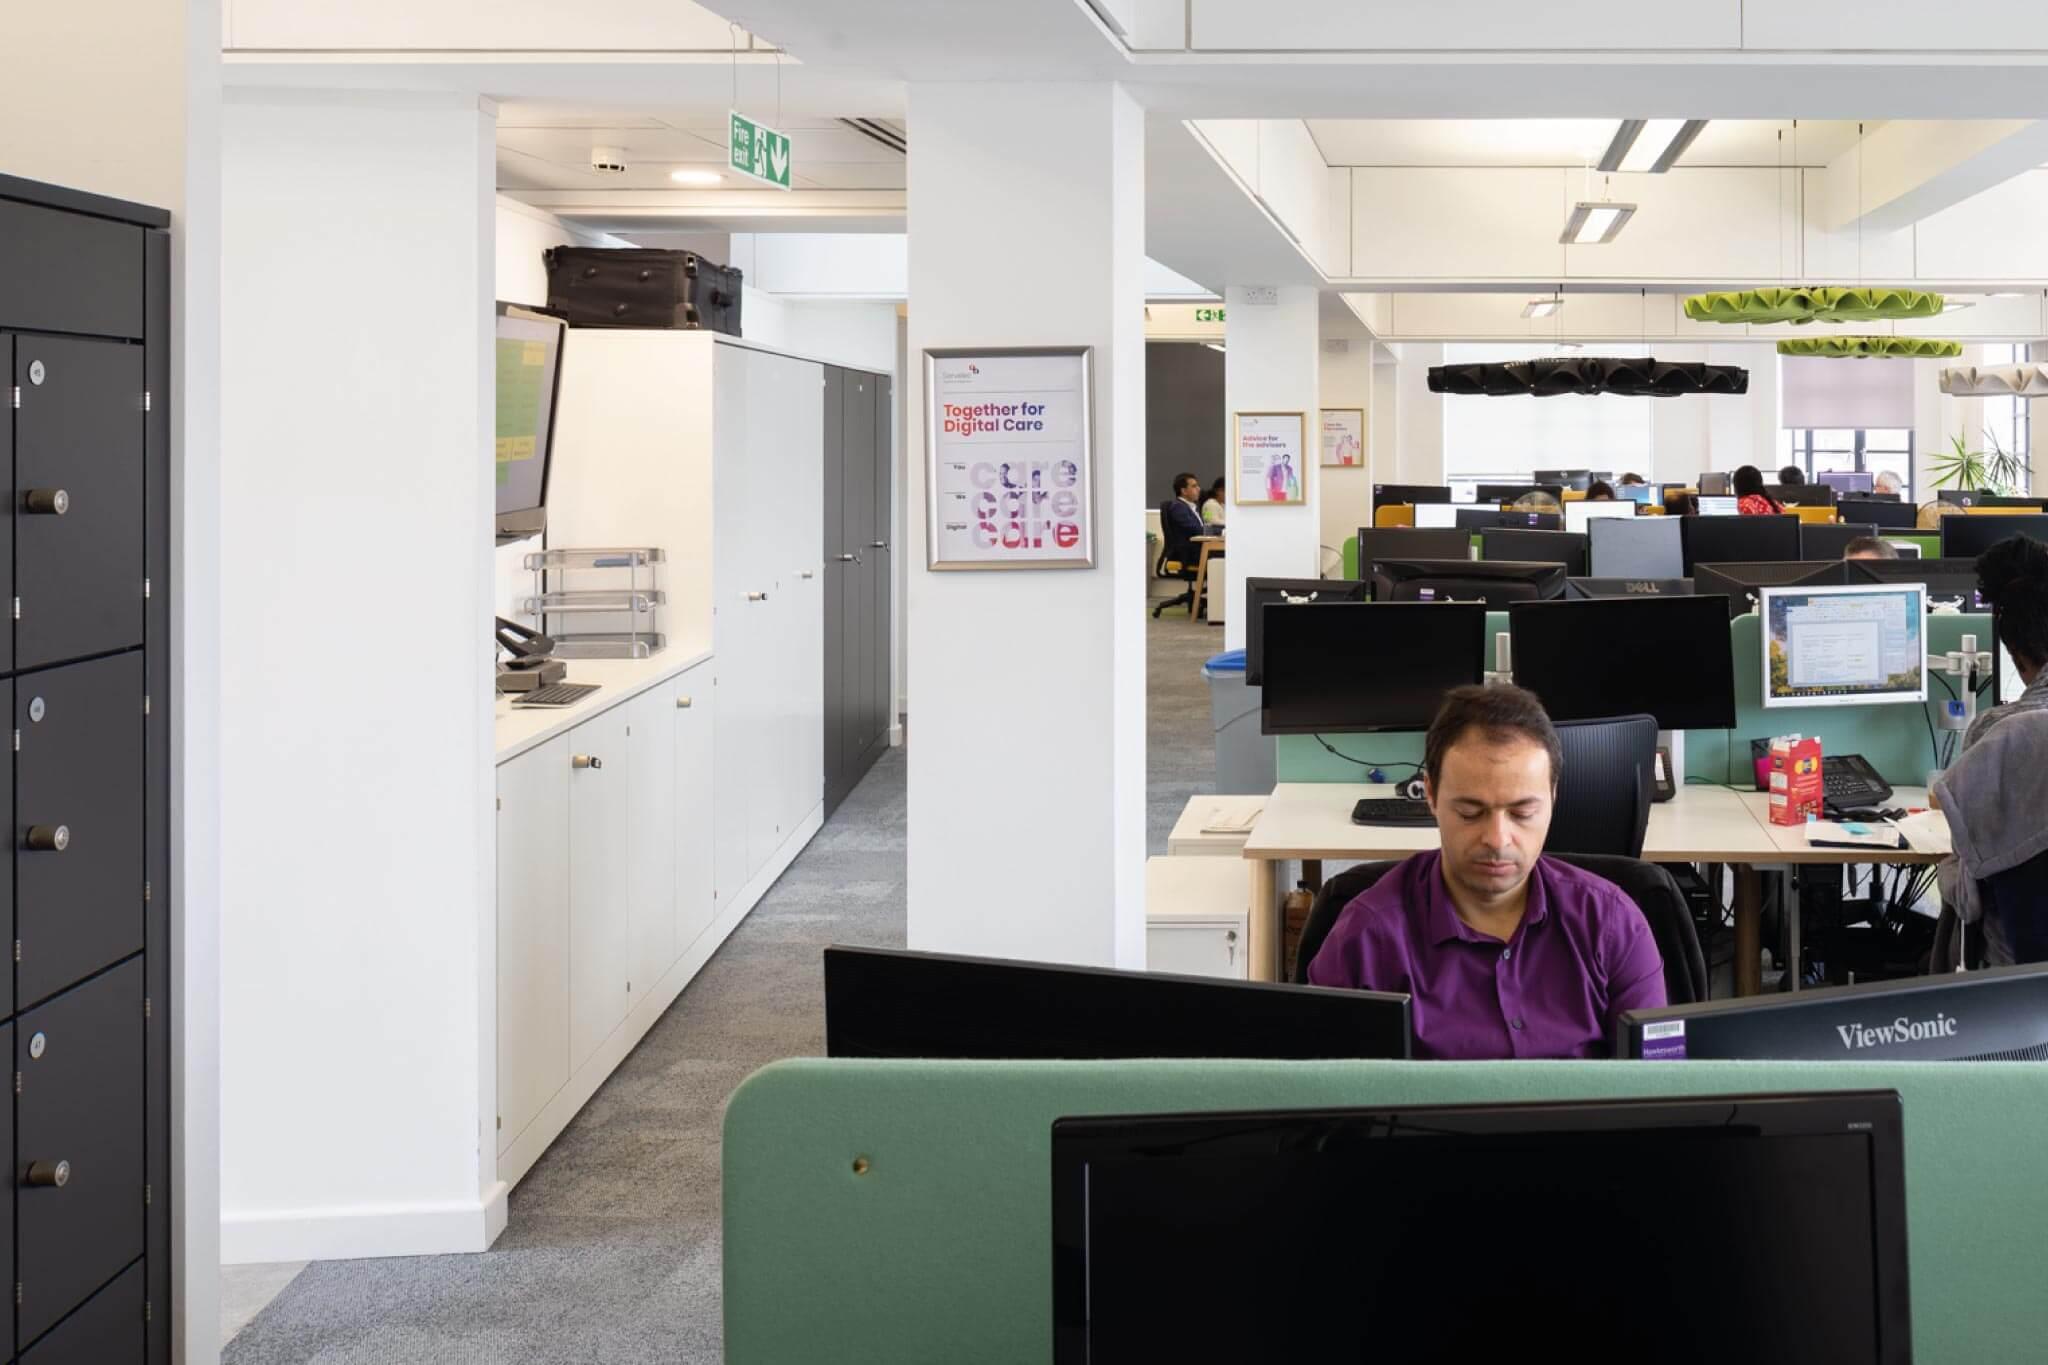 Servelec---London---Dale-Office-Interiors---Office---View-1-2019